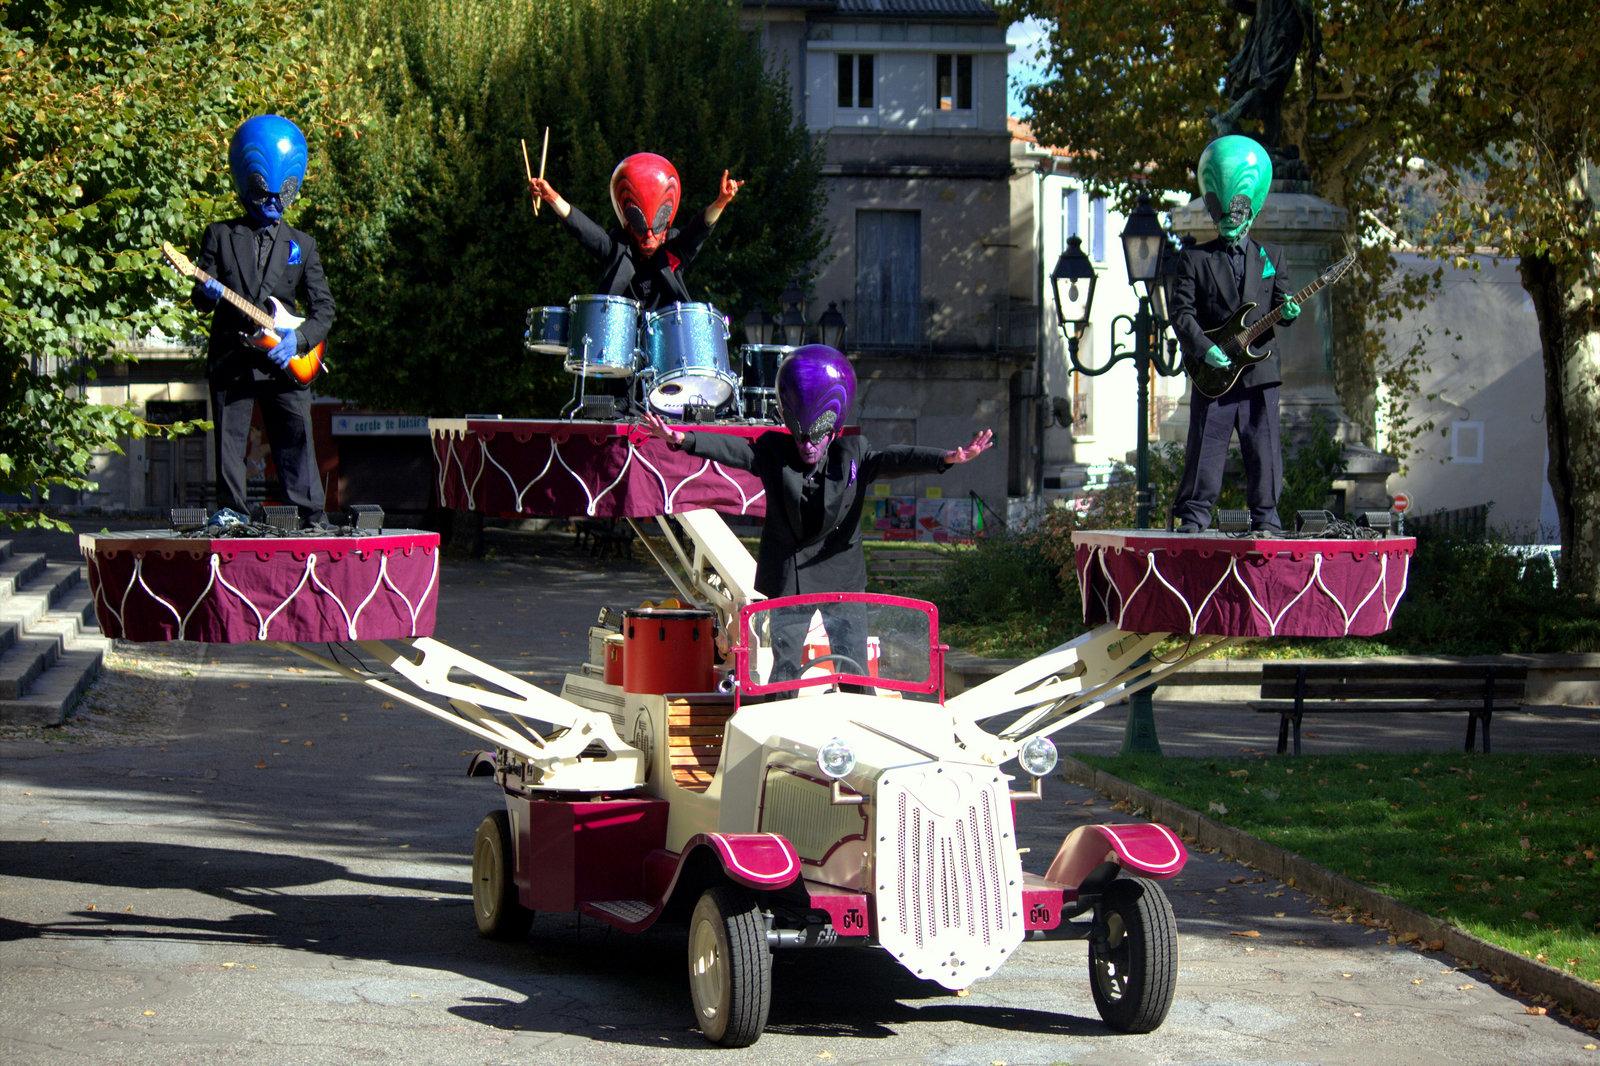 Spectacle de rue musical Crazy Tacot